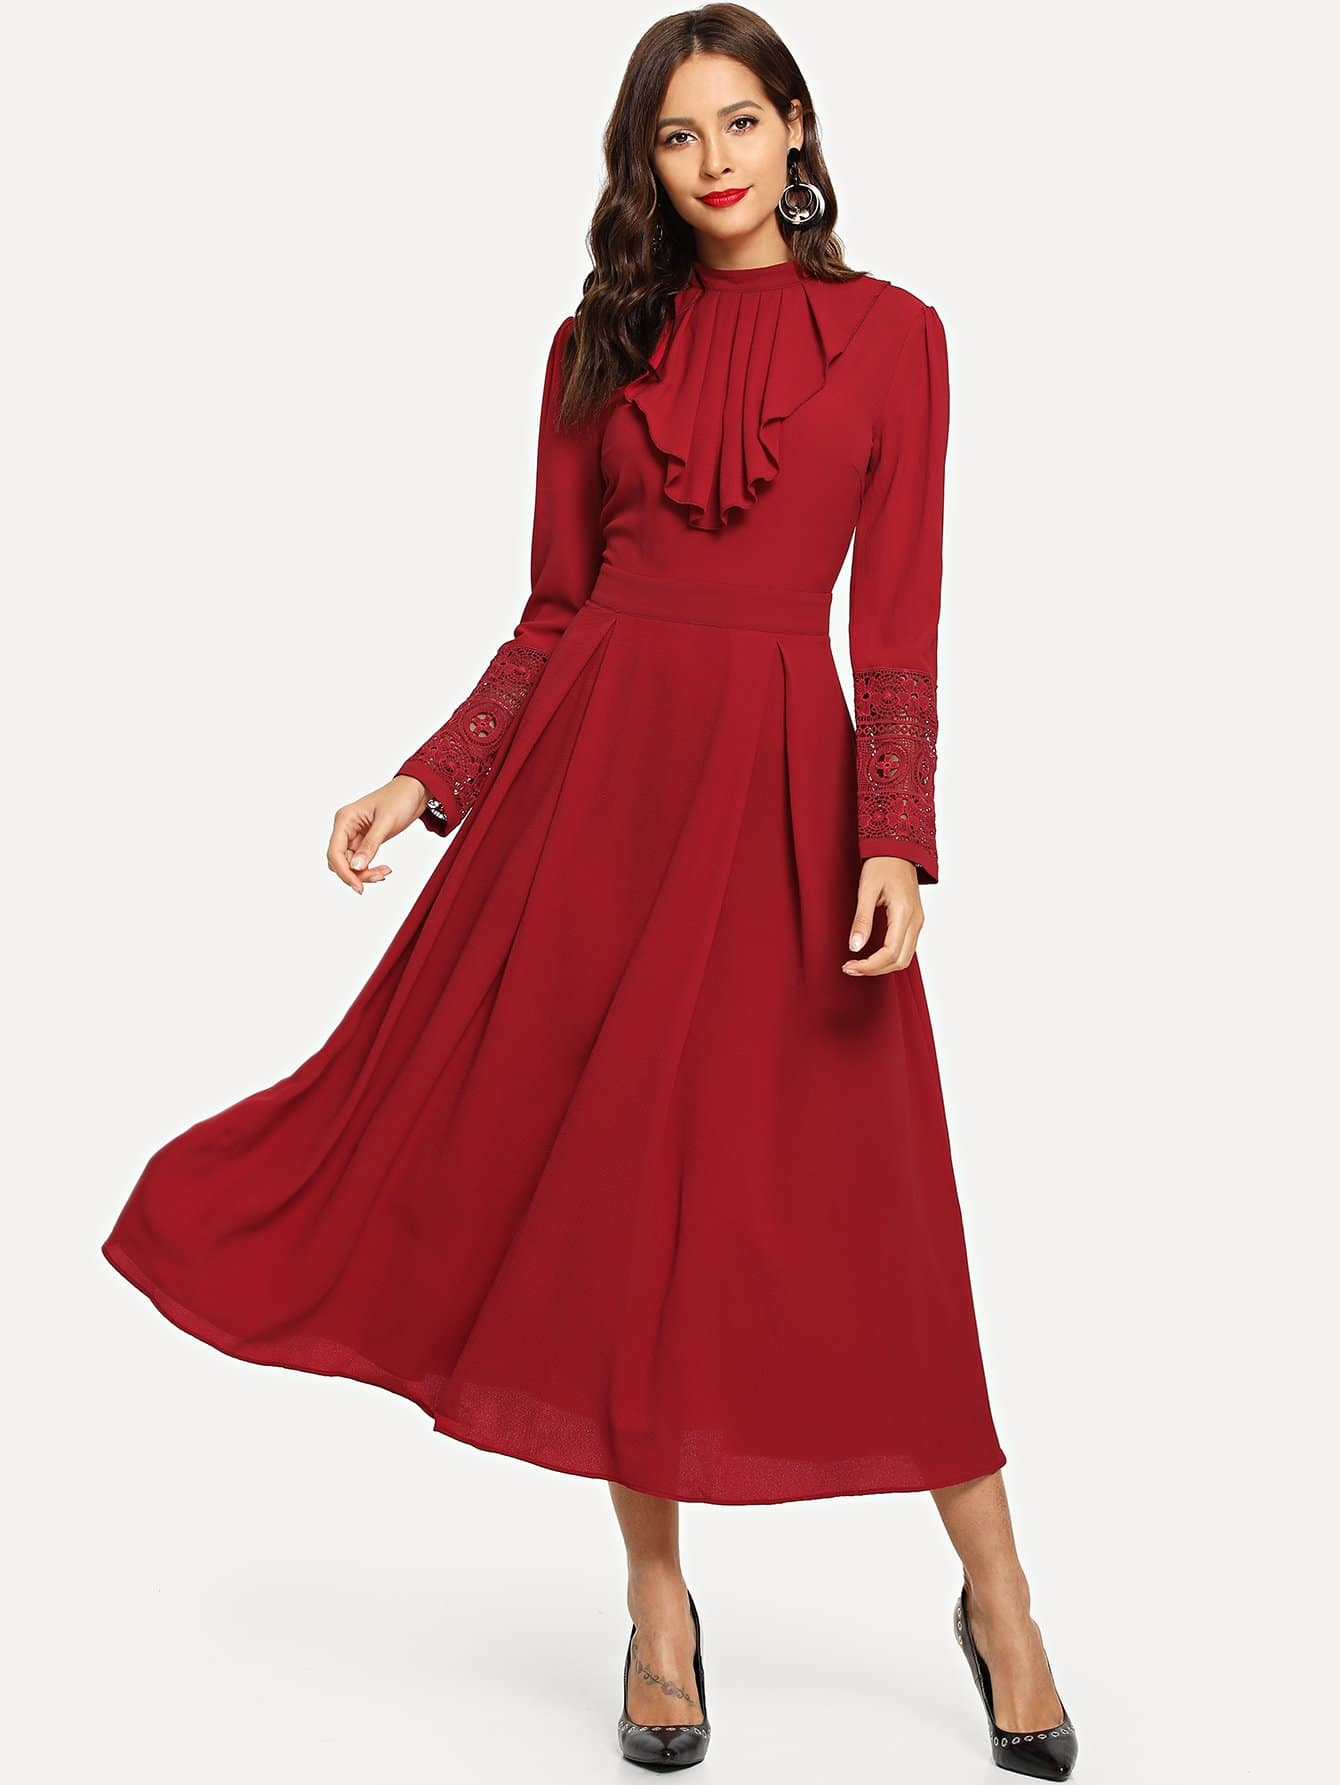 Mock Neck Guipure Lace Trim Ruffle Плиссированное платье